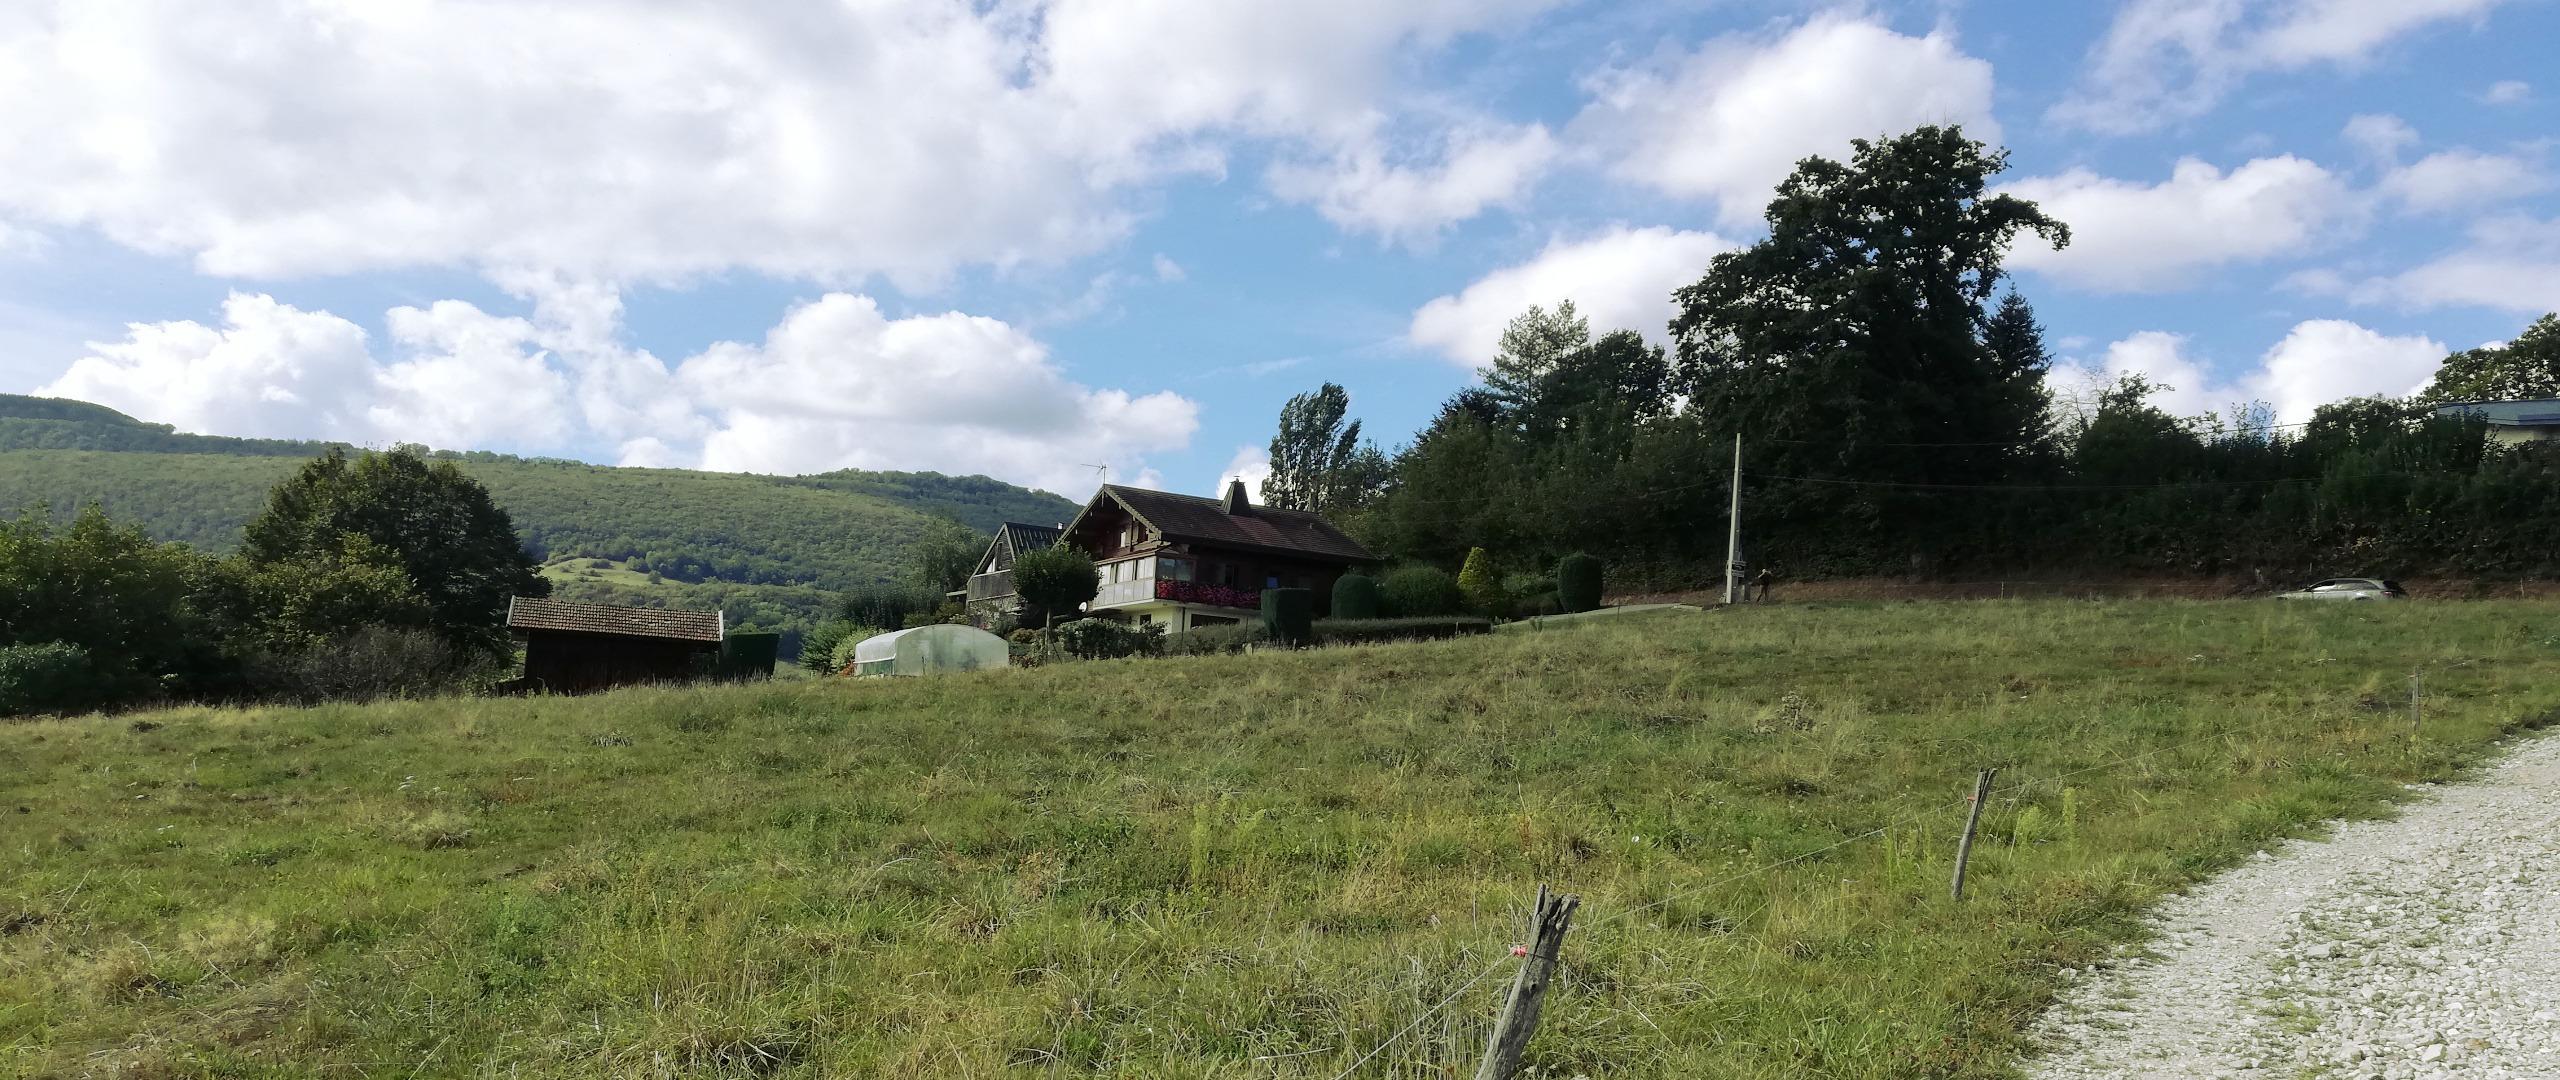 Rumilly_Haut de Célaz3